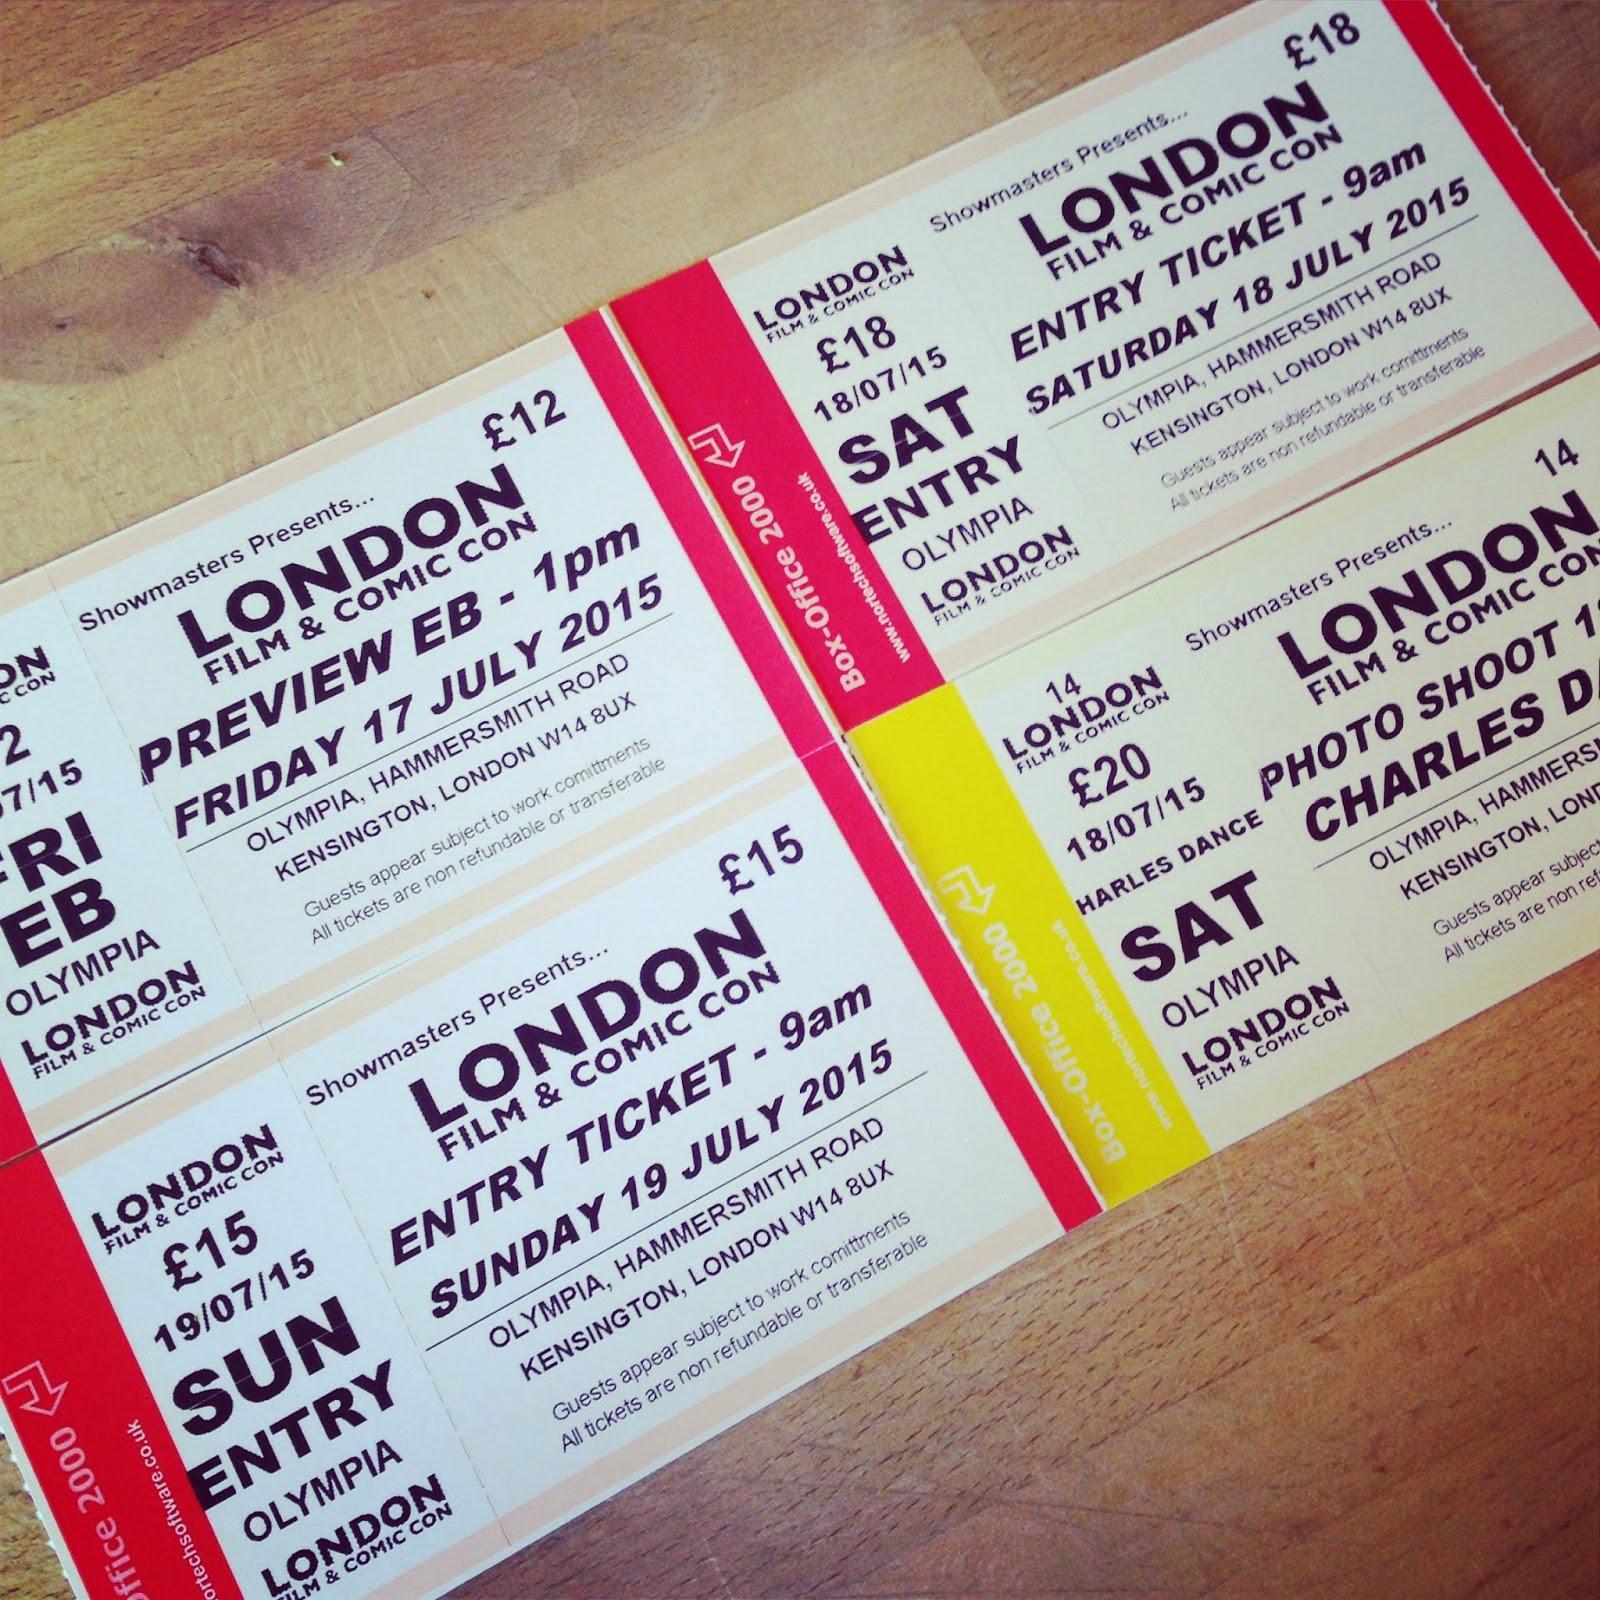 LFCC 2015 tickets